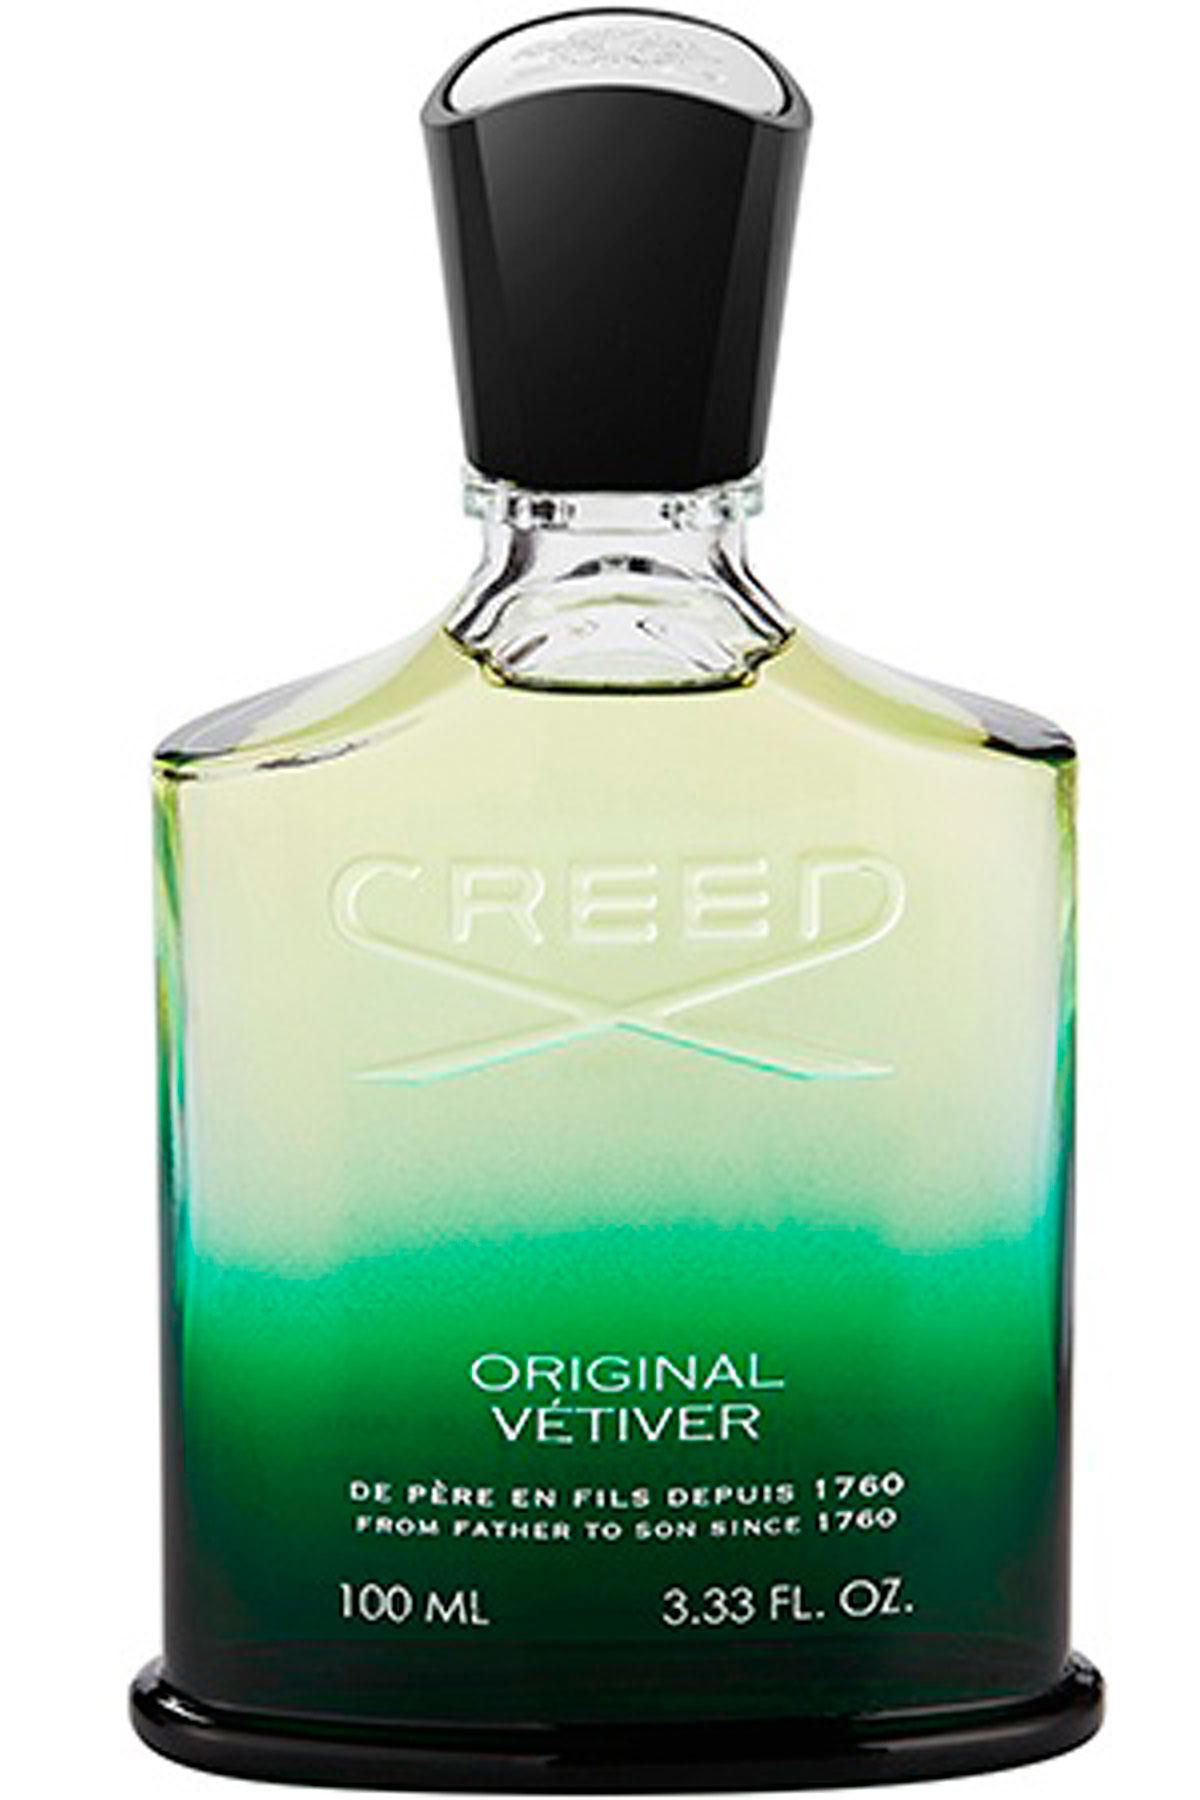 Creed Fragrances for Men, Original Vetiver - Eau De Parfum - 100 Ml, 2019, 100 ml